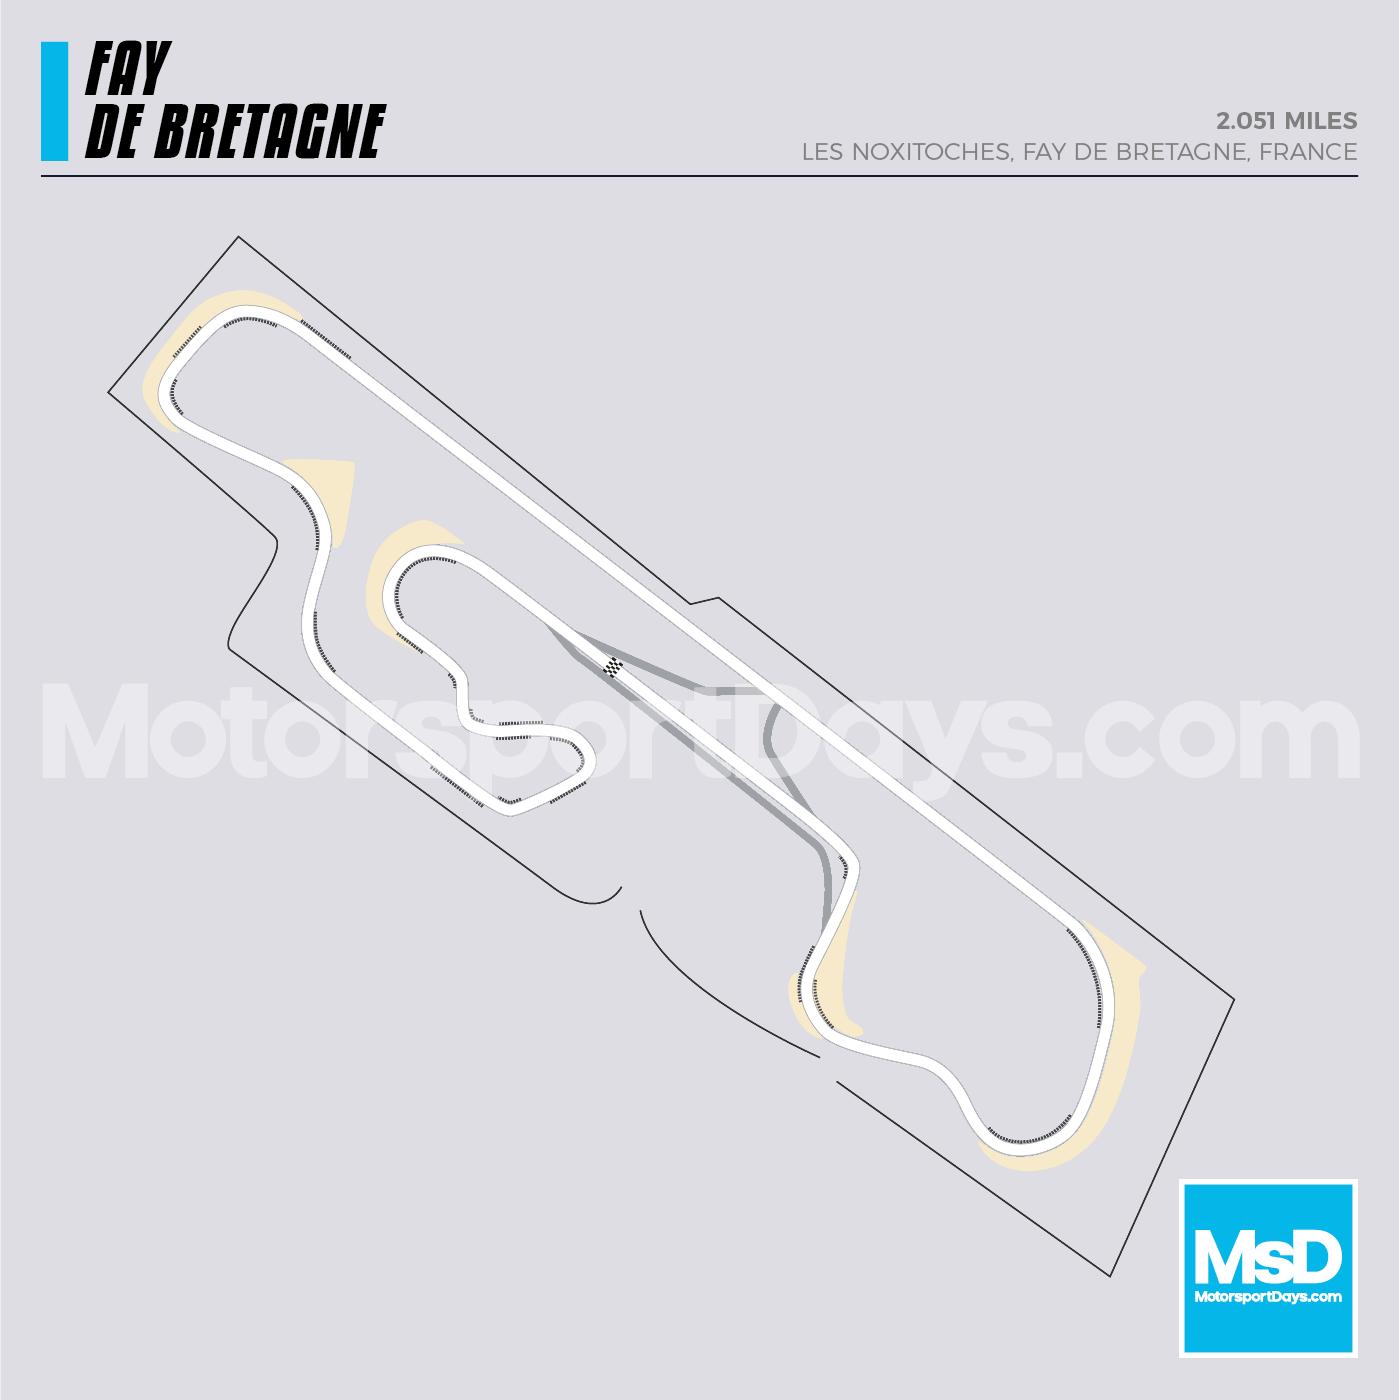 Fay-De-Bretagne-Circuit-track-map